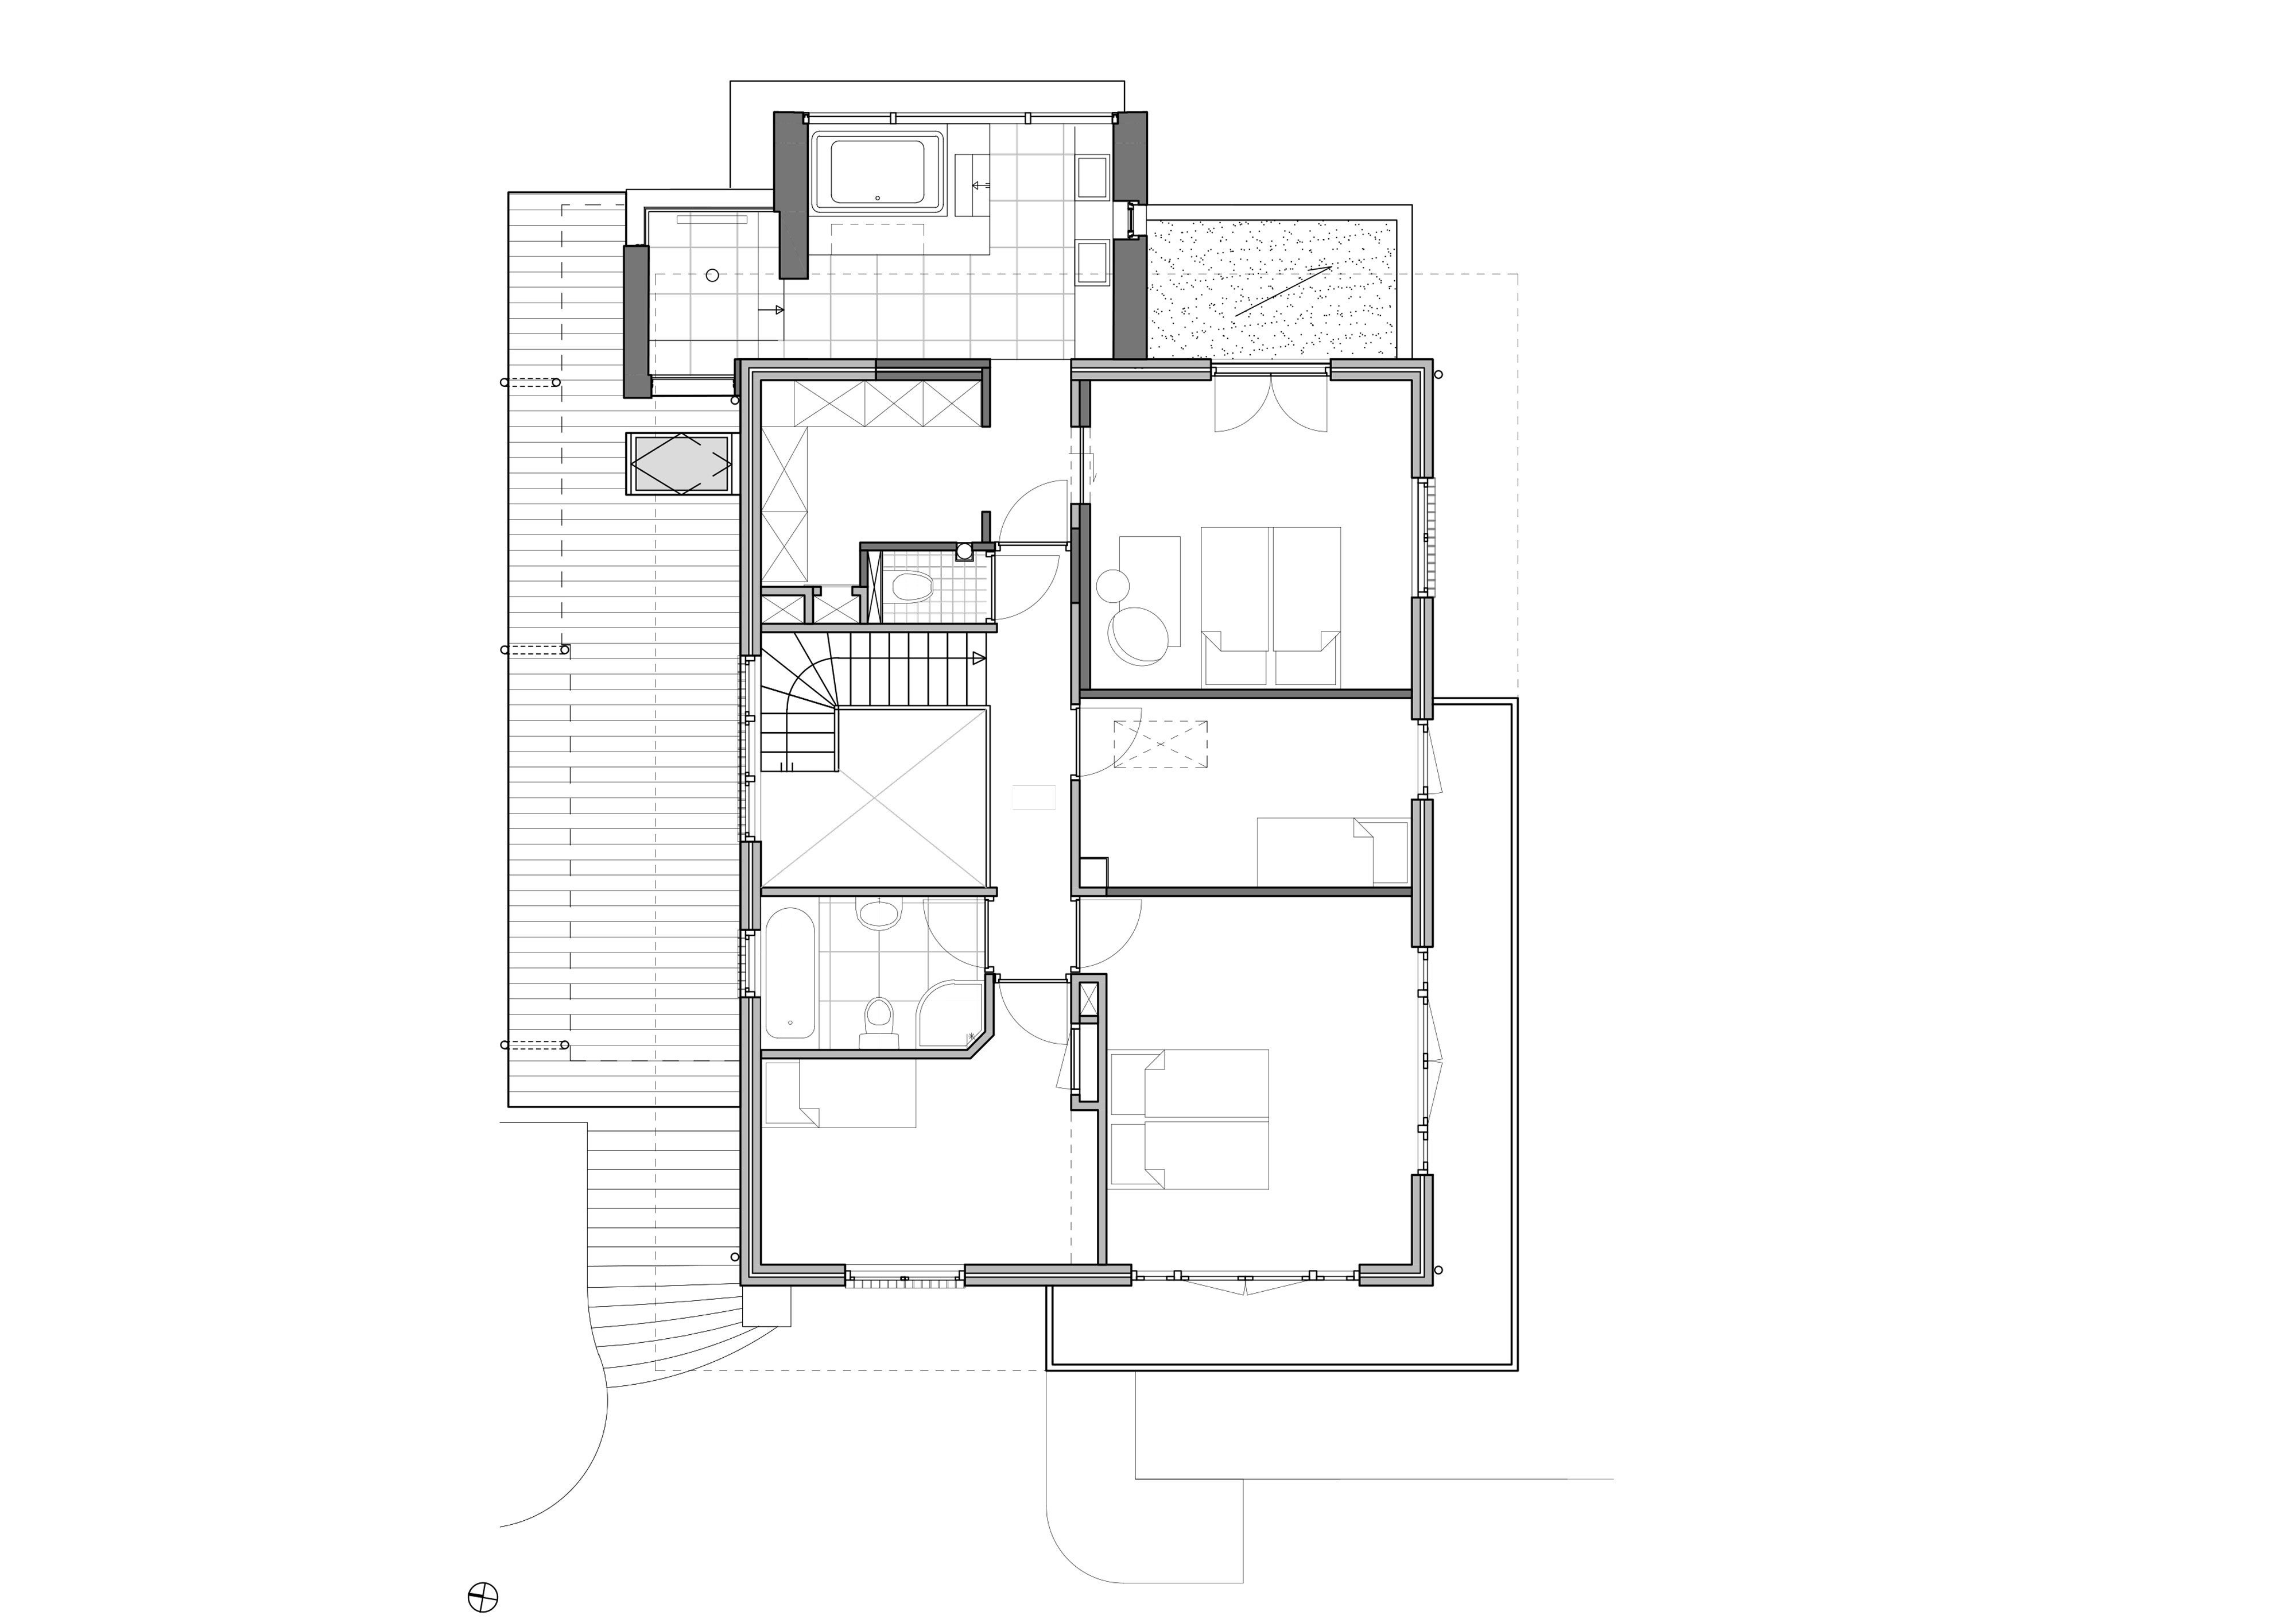 <p>1ste verdieping nieuw</p>